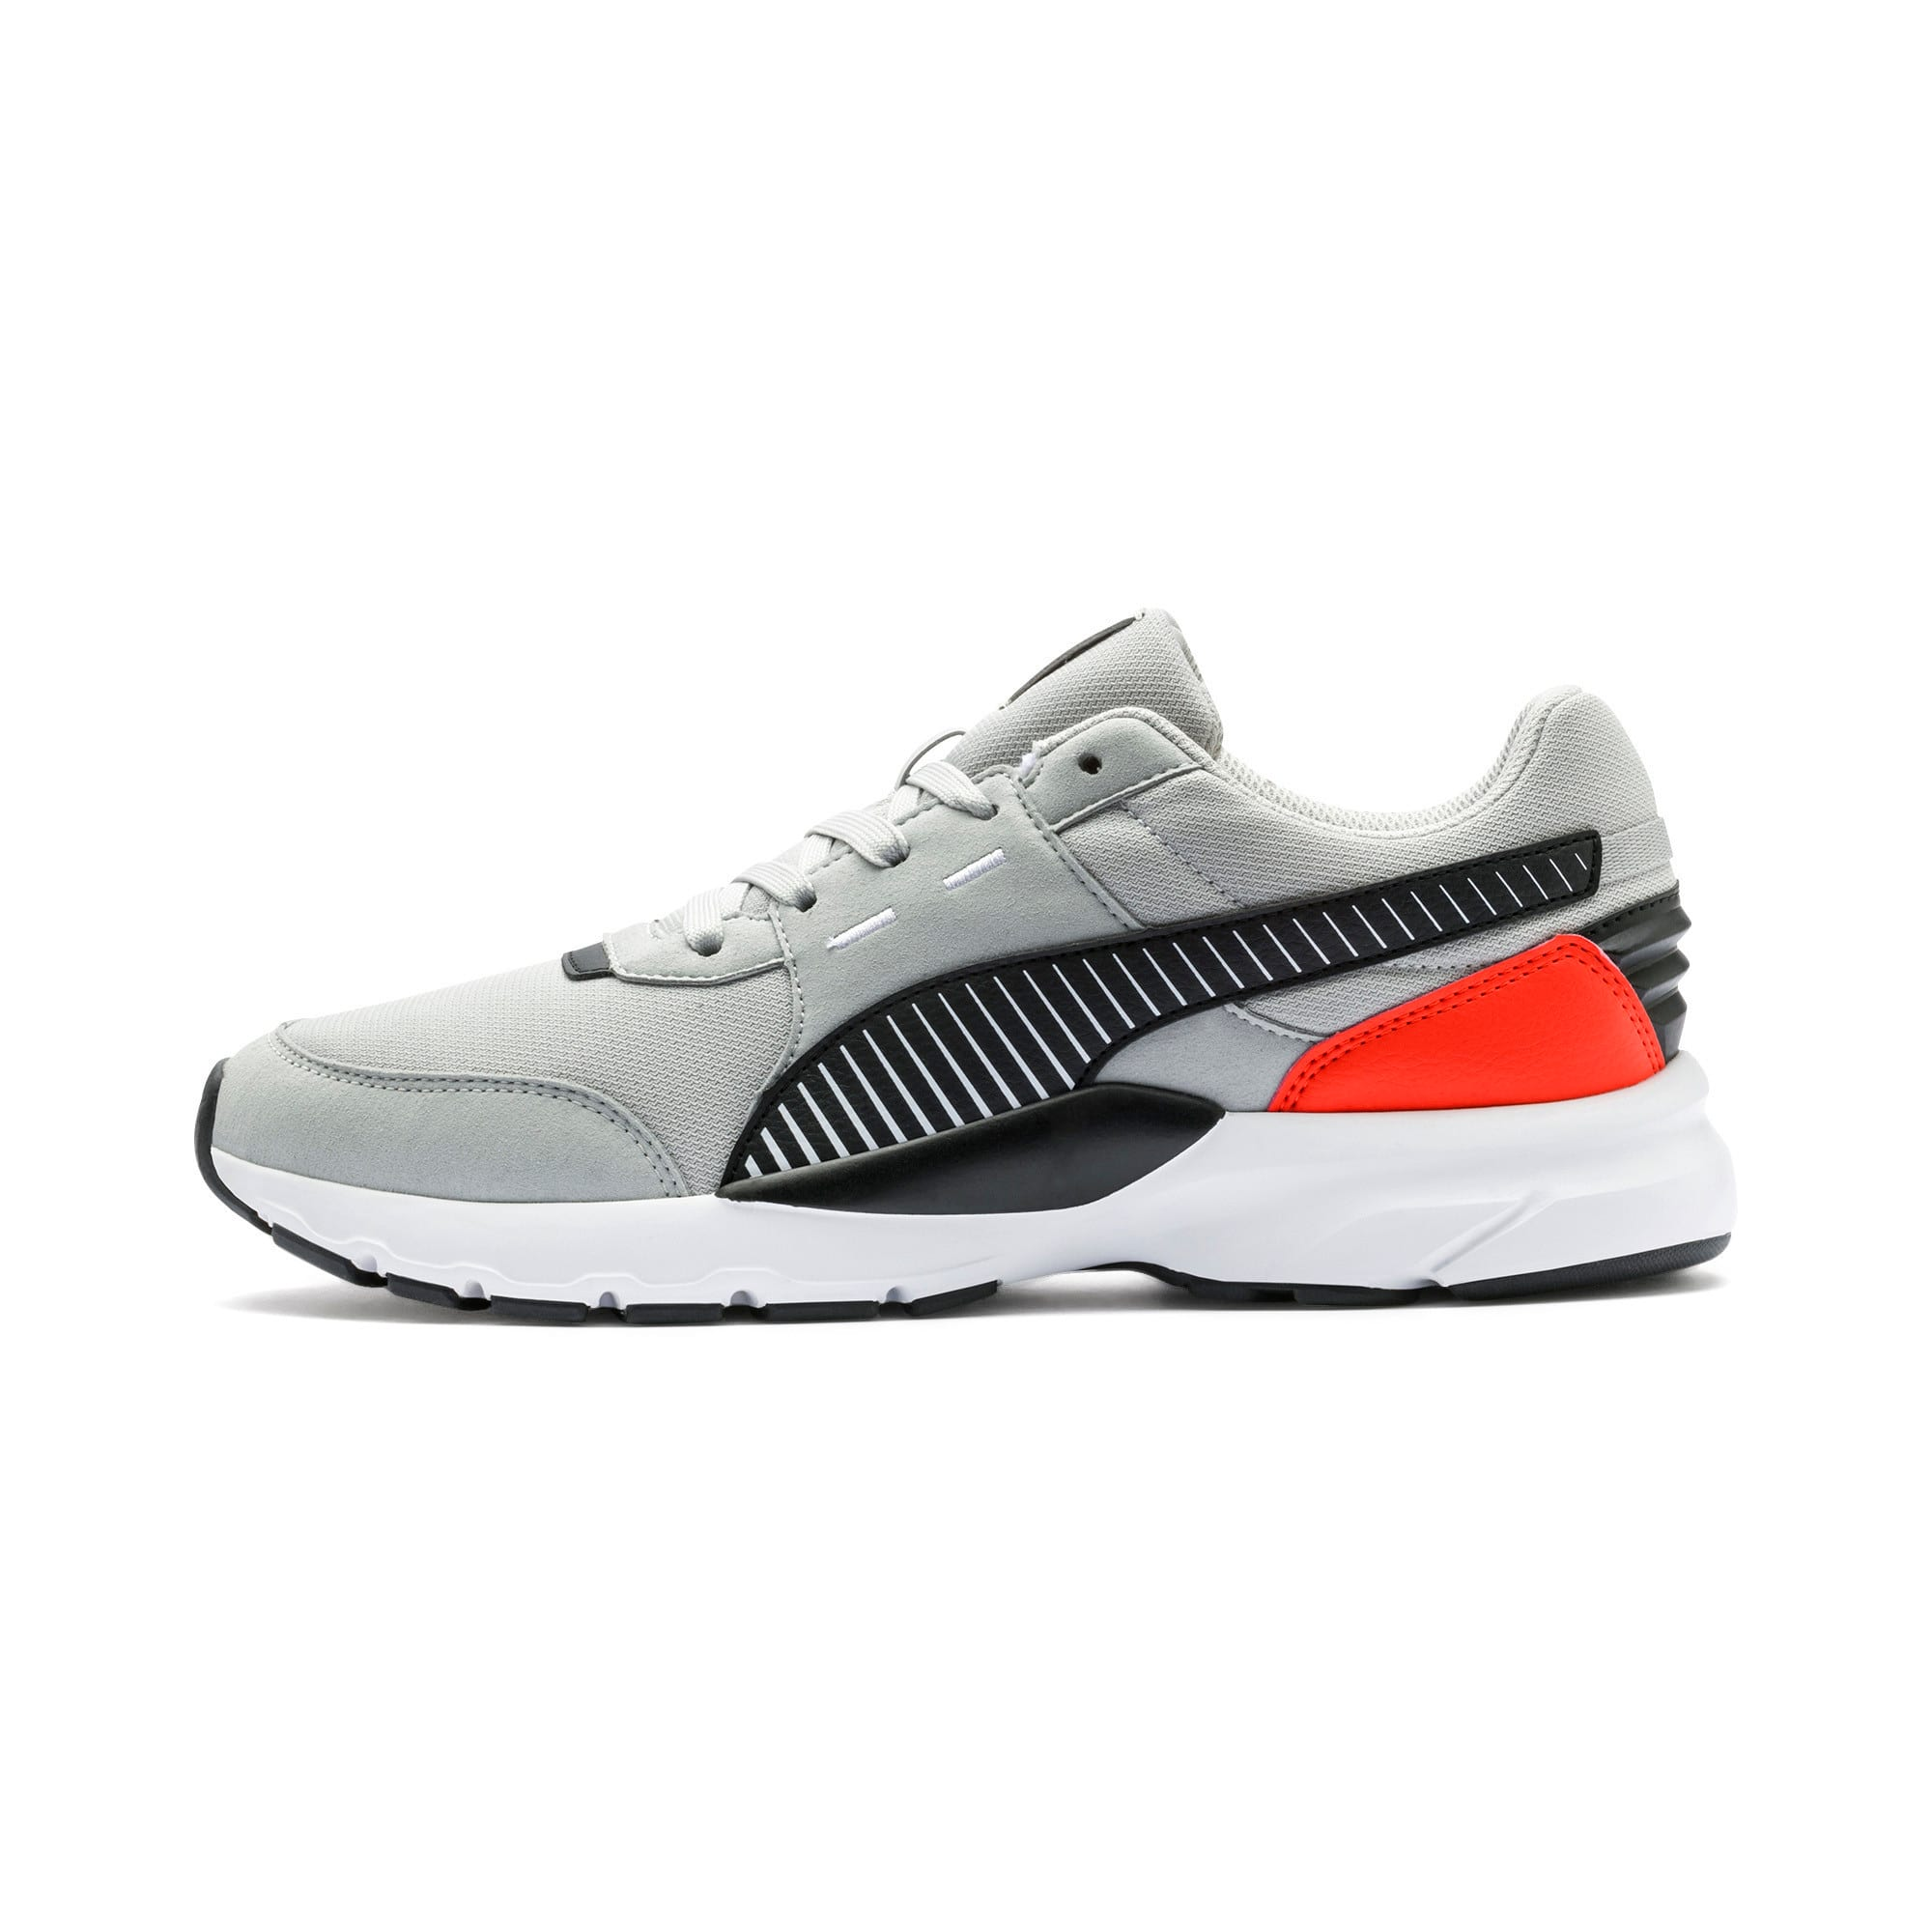 Thumbnail 1 of Future Runner Running Shoes, High Rise-Black-C Tomato-Wht, medium-IND